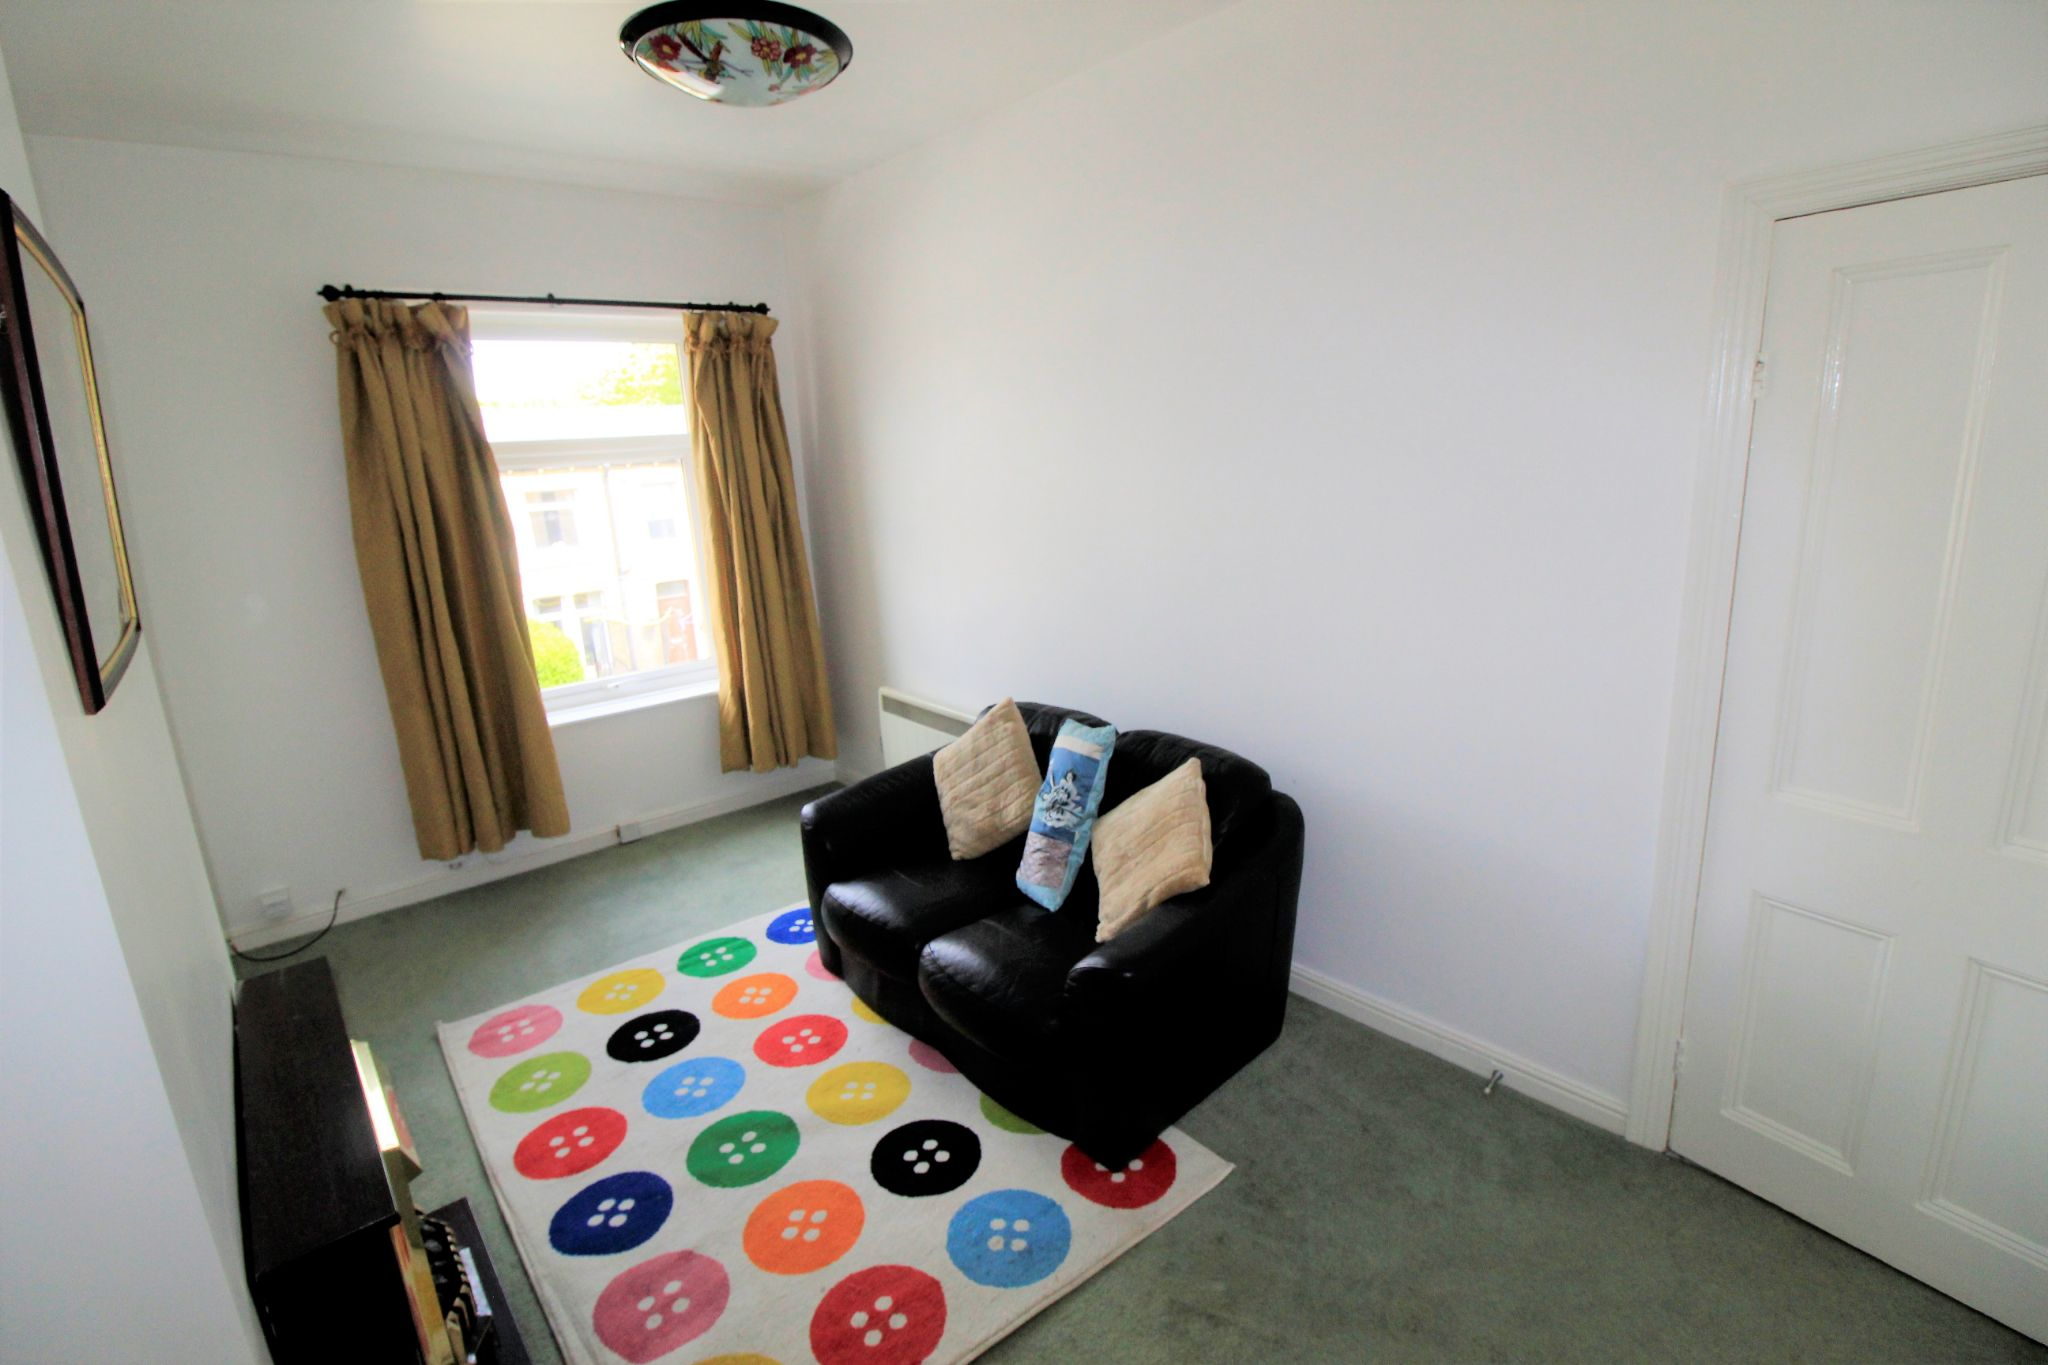 1 bedroom flat flat/apartment Let in Huddersfield - Lounge